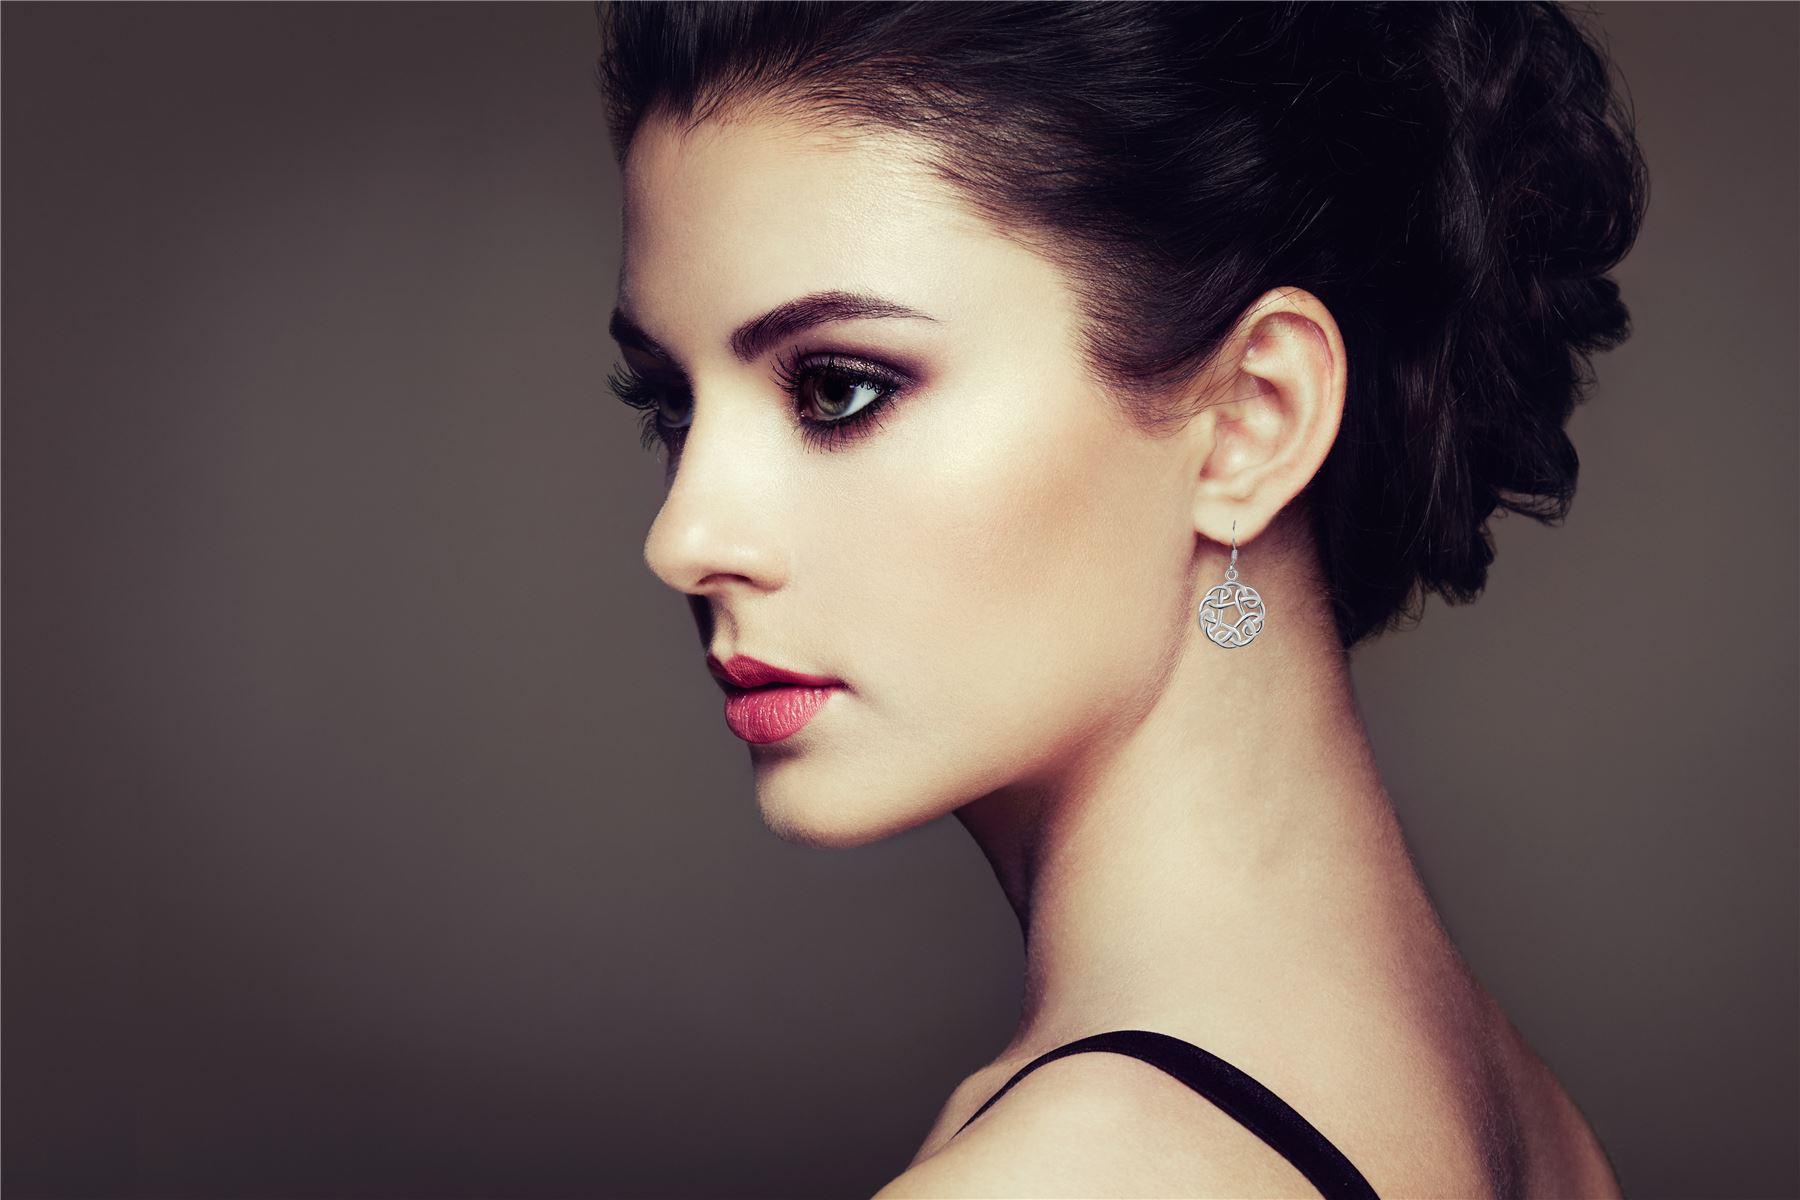 Amberta-925-Sterling-Silver-Celtic-Knot-Earrings-for-Women-Irish-Design miniature 23